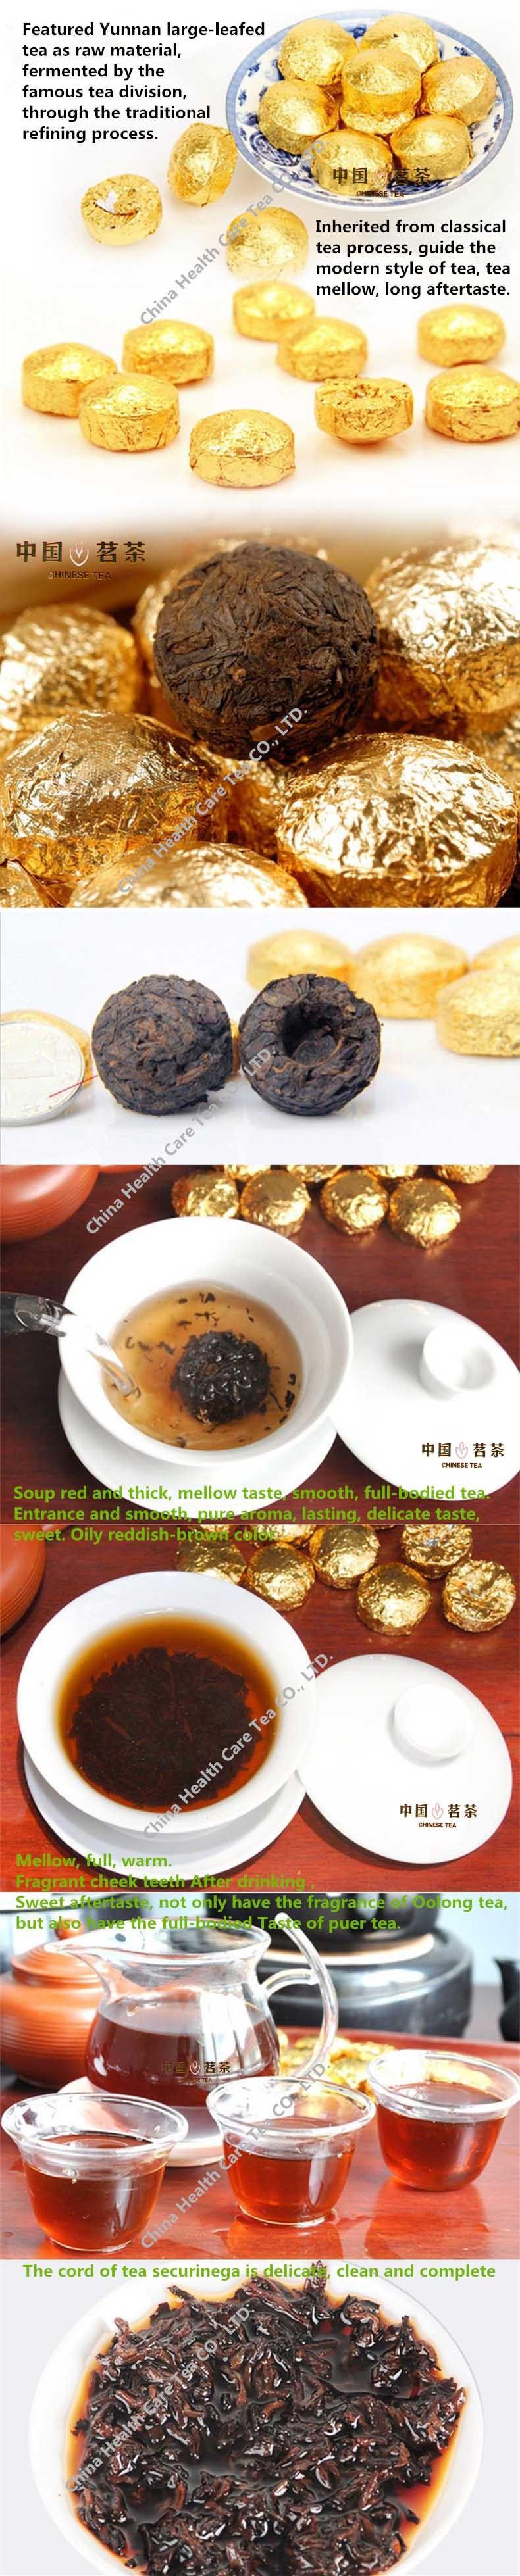 15 Pcs PuEr Tea High Quality Chinese Yunnan Pu'Er Tea Mini Pu Er Tuocha puerh tea lose weight Organic Green Food